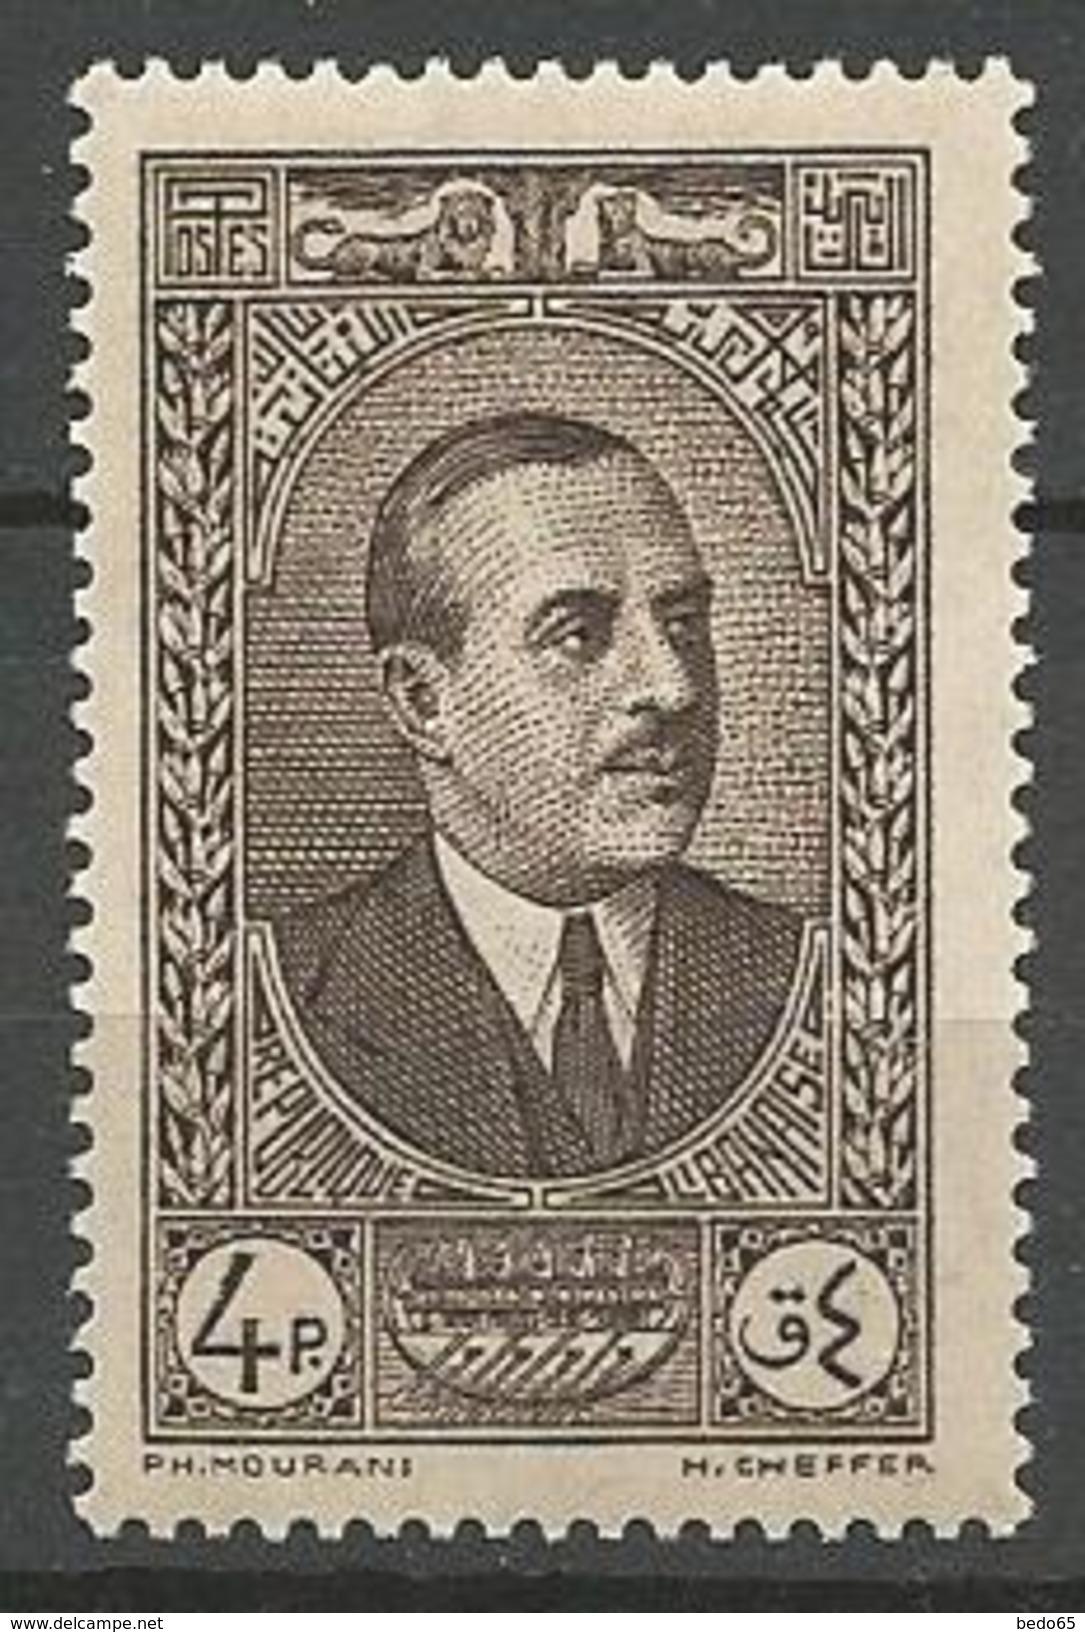 GRAND LIBAN   N° 153 NEUF** LUXE   SANS CHARNIERE / MNH - Great Lebanon (1924-1945)